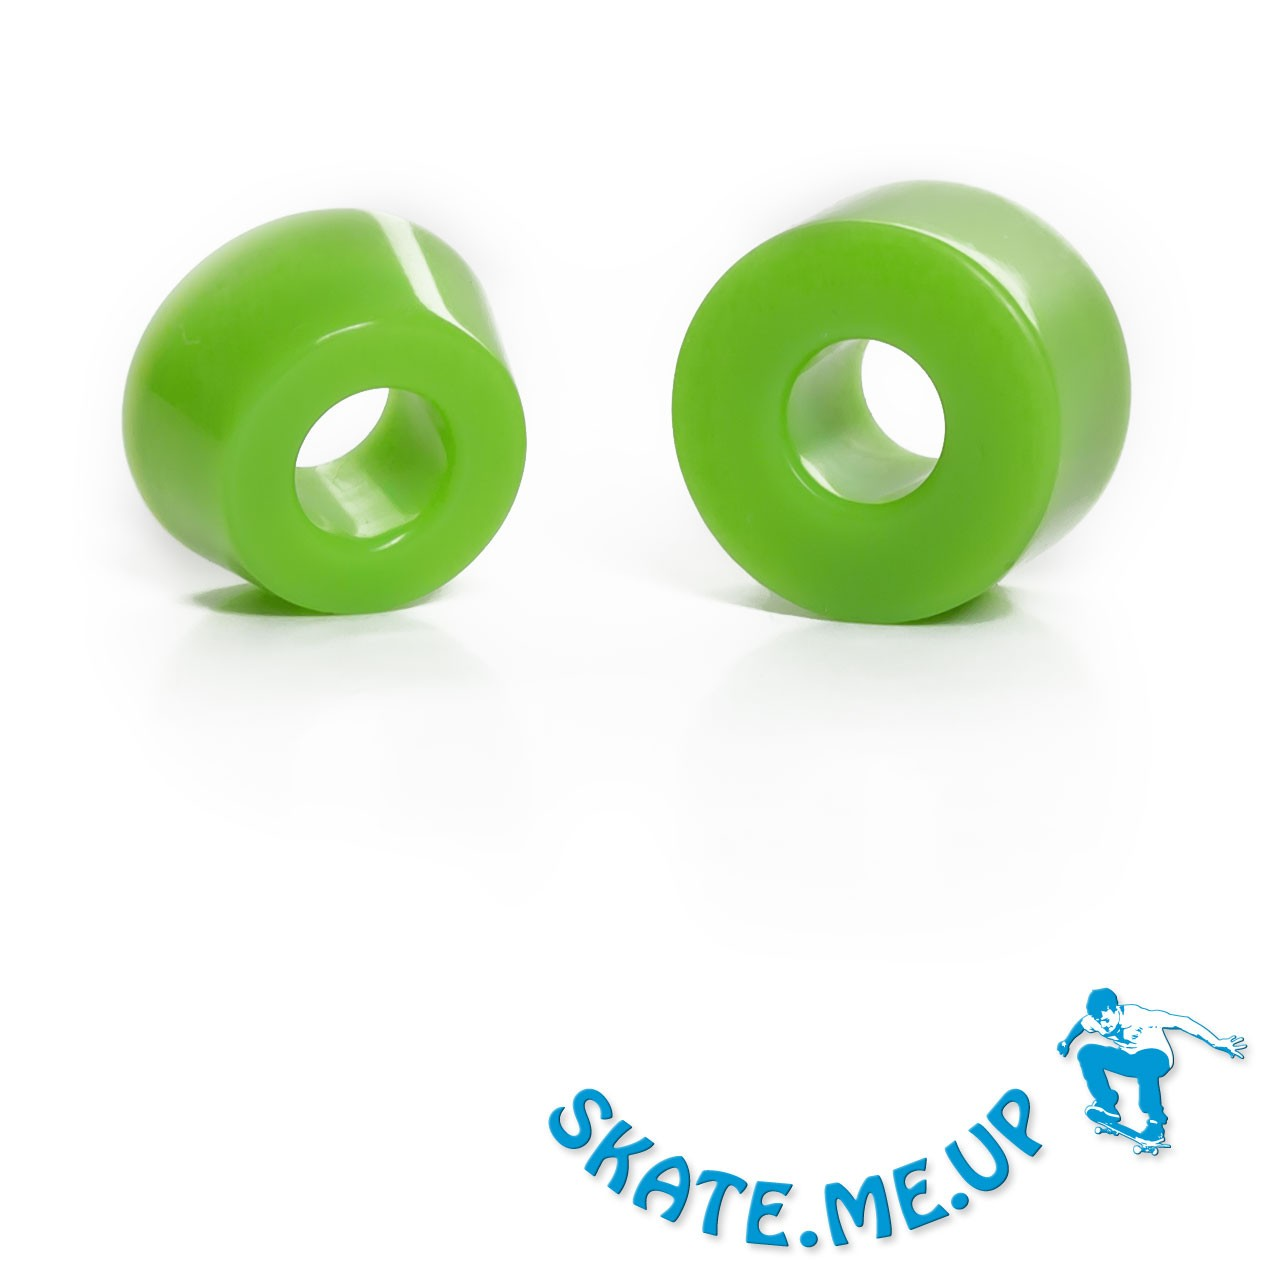 Skateboard / Longboard - Bushings - Lenkgummi Set für eine Achse - 85A grün (weicher)